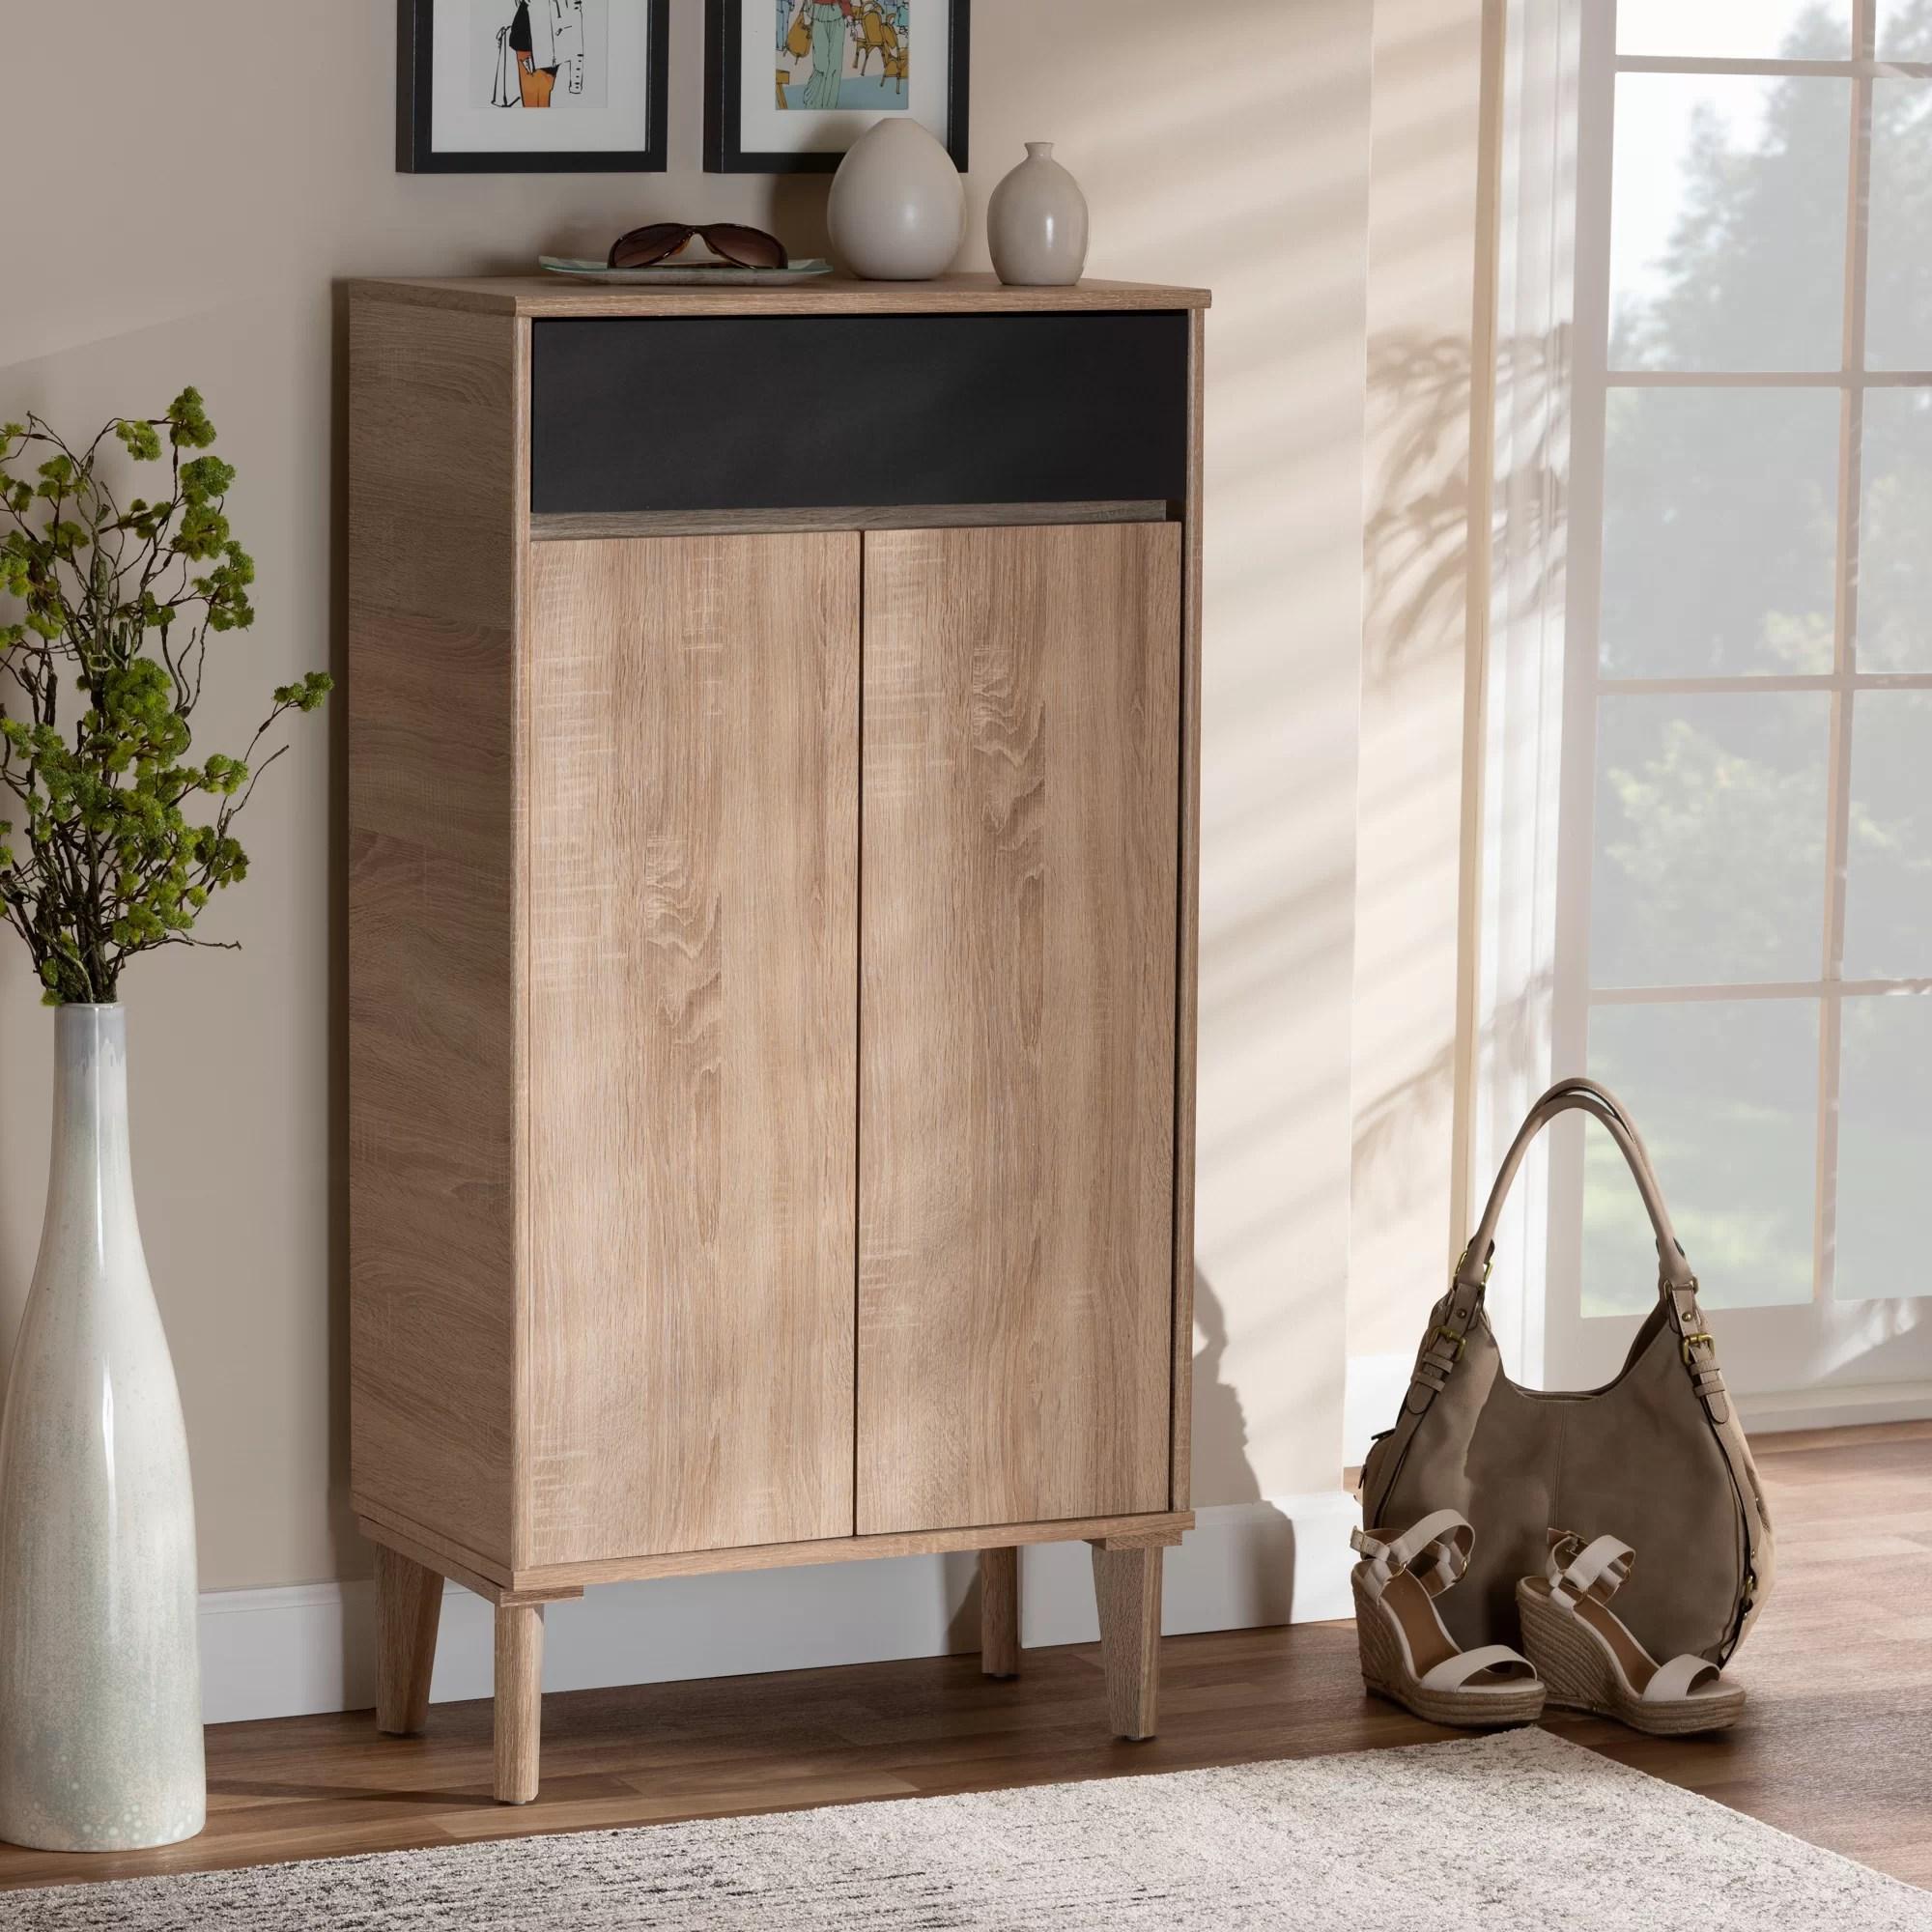 Union Rustic 2 Door Wood Entryway 10 Pair Shoe Storage Cabinet Reviews